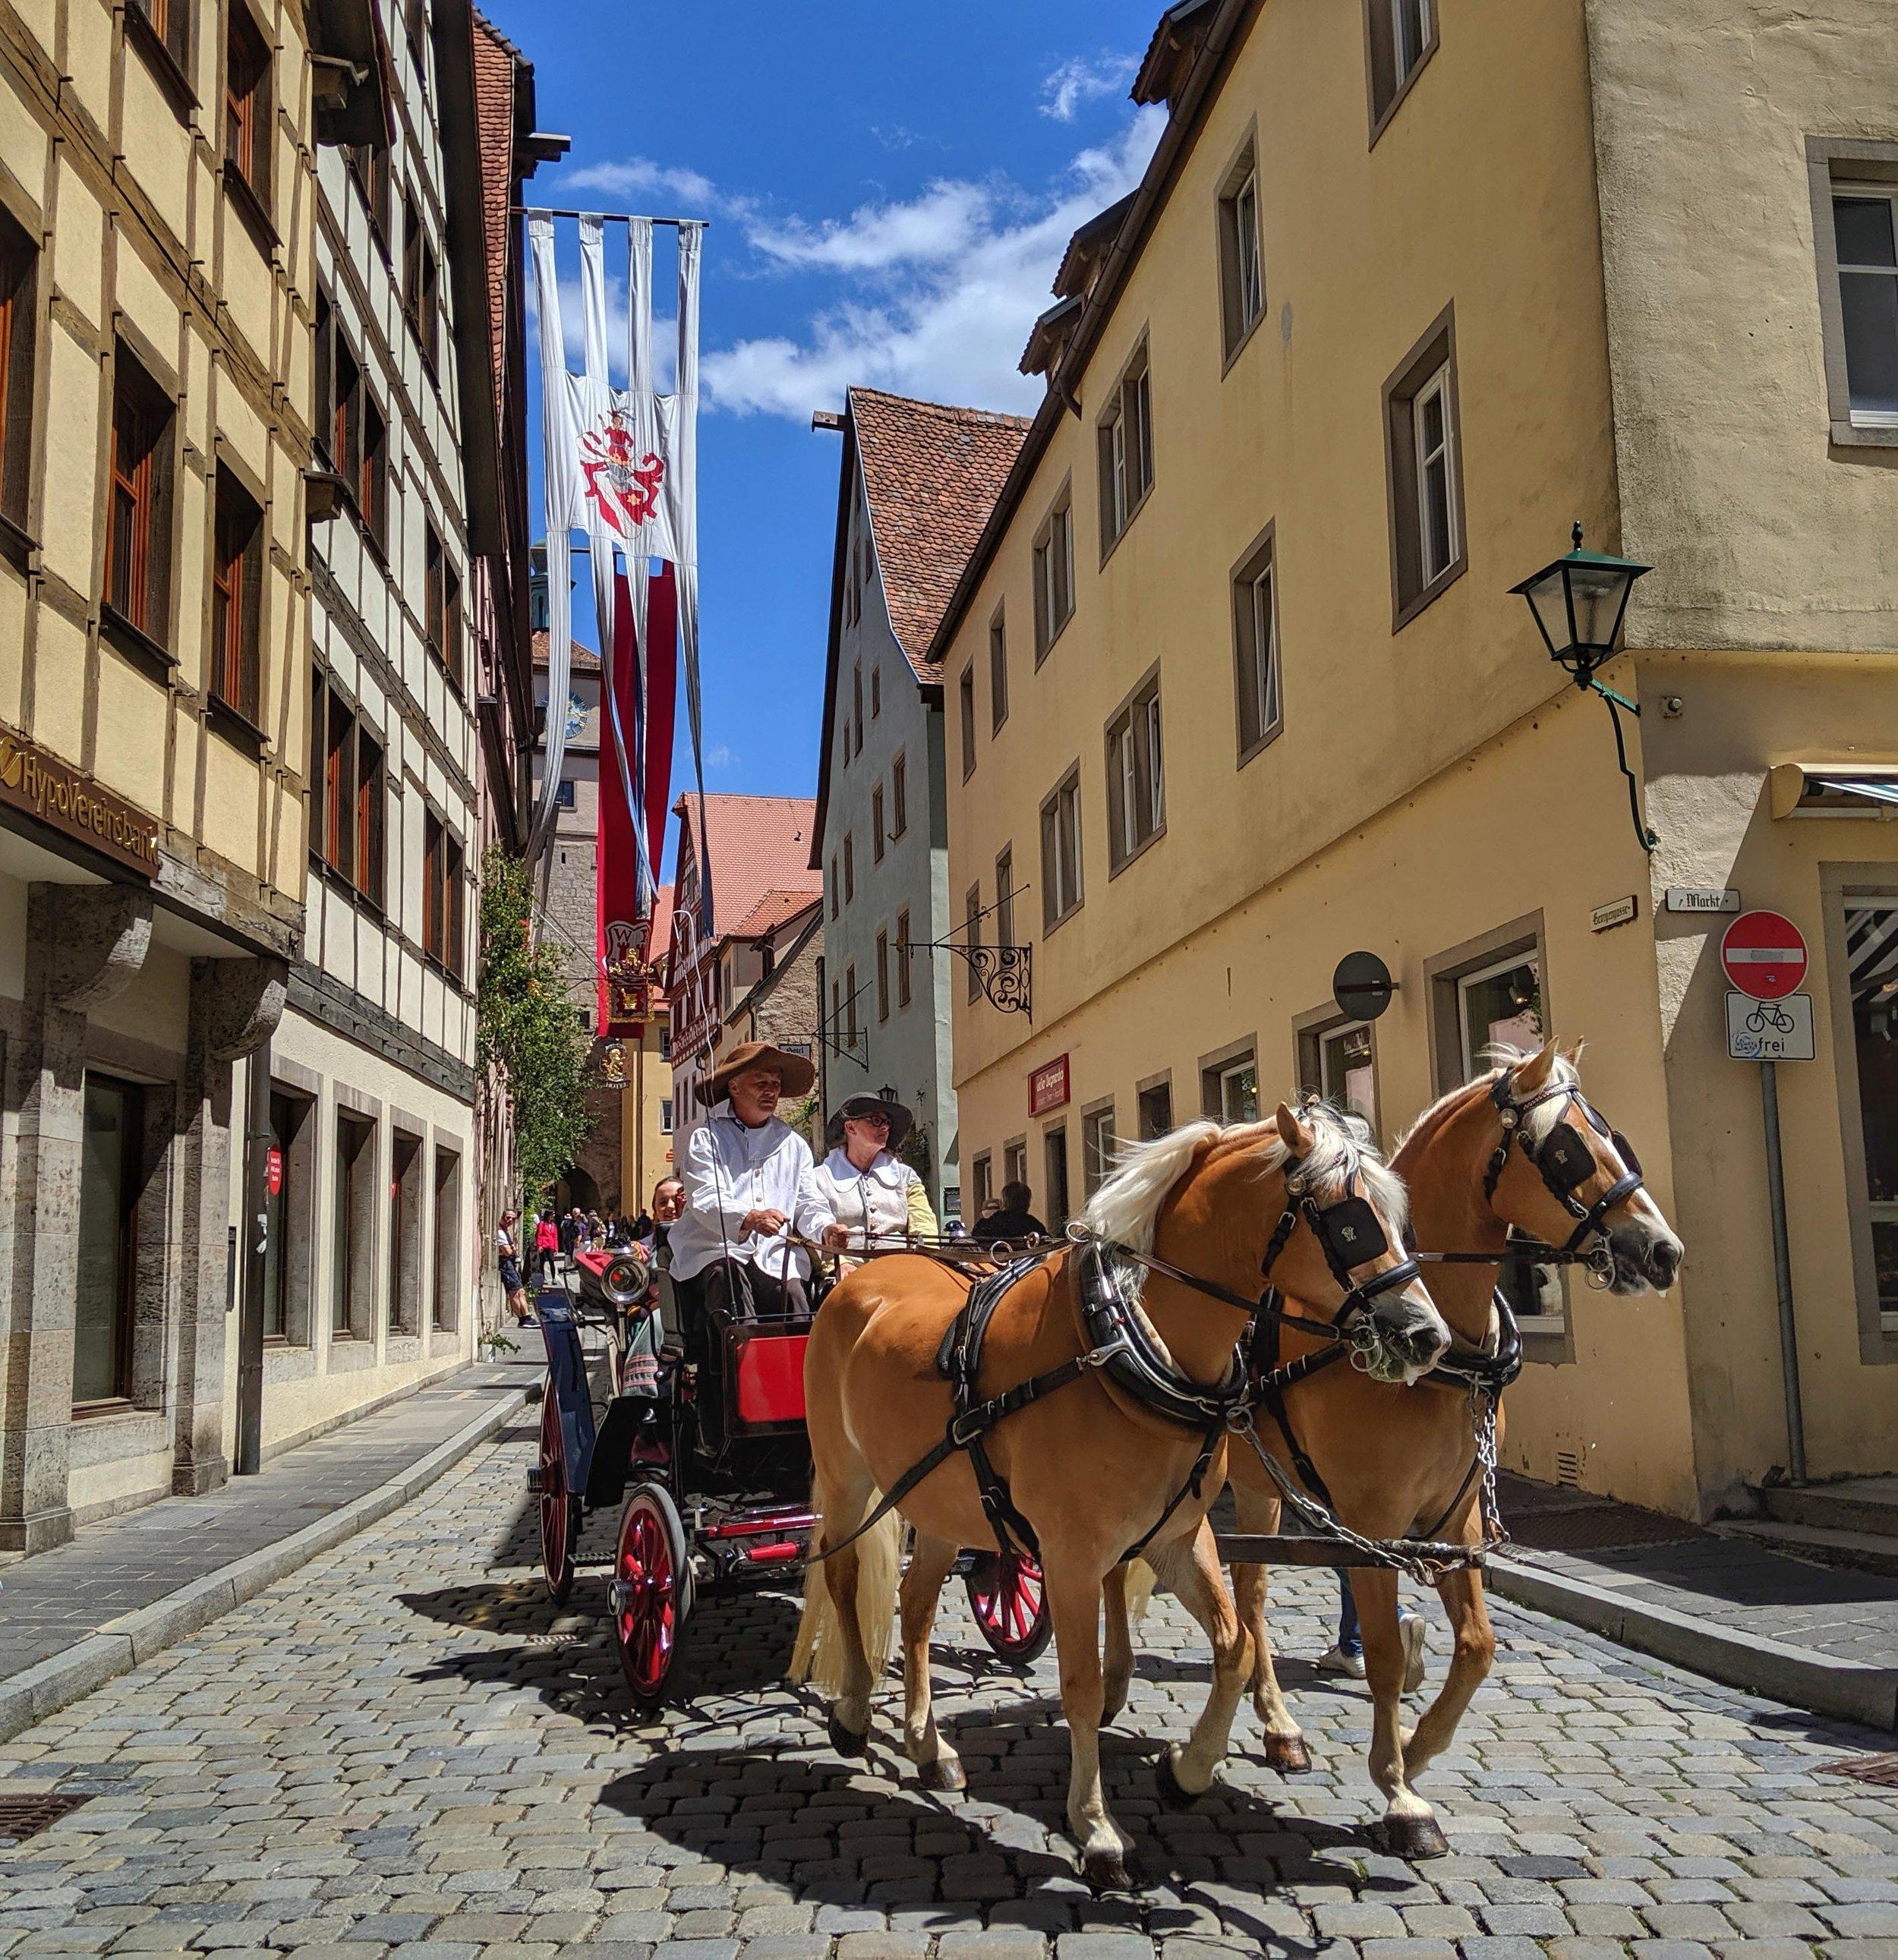 Rothenburg ob der Tauber Festival